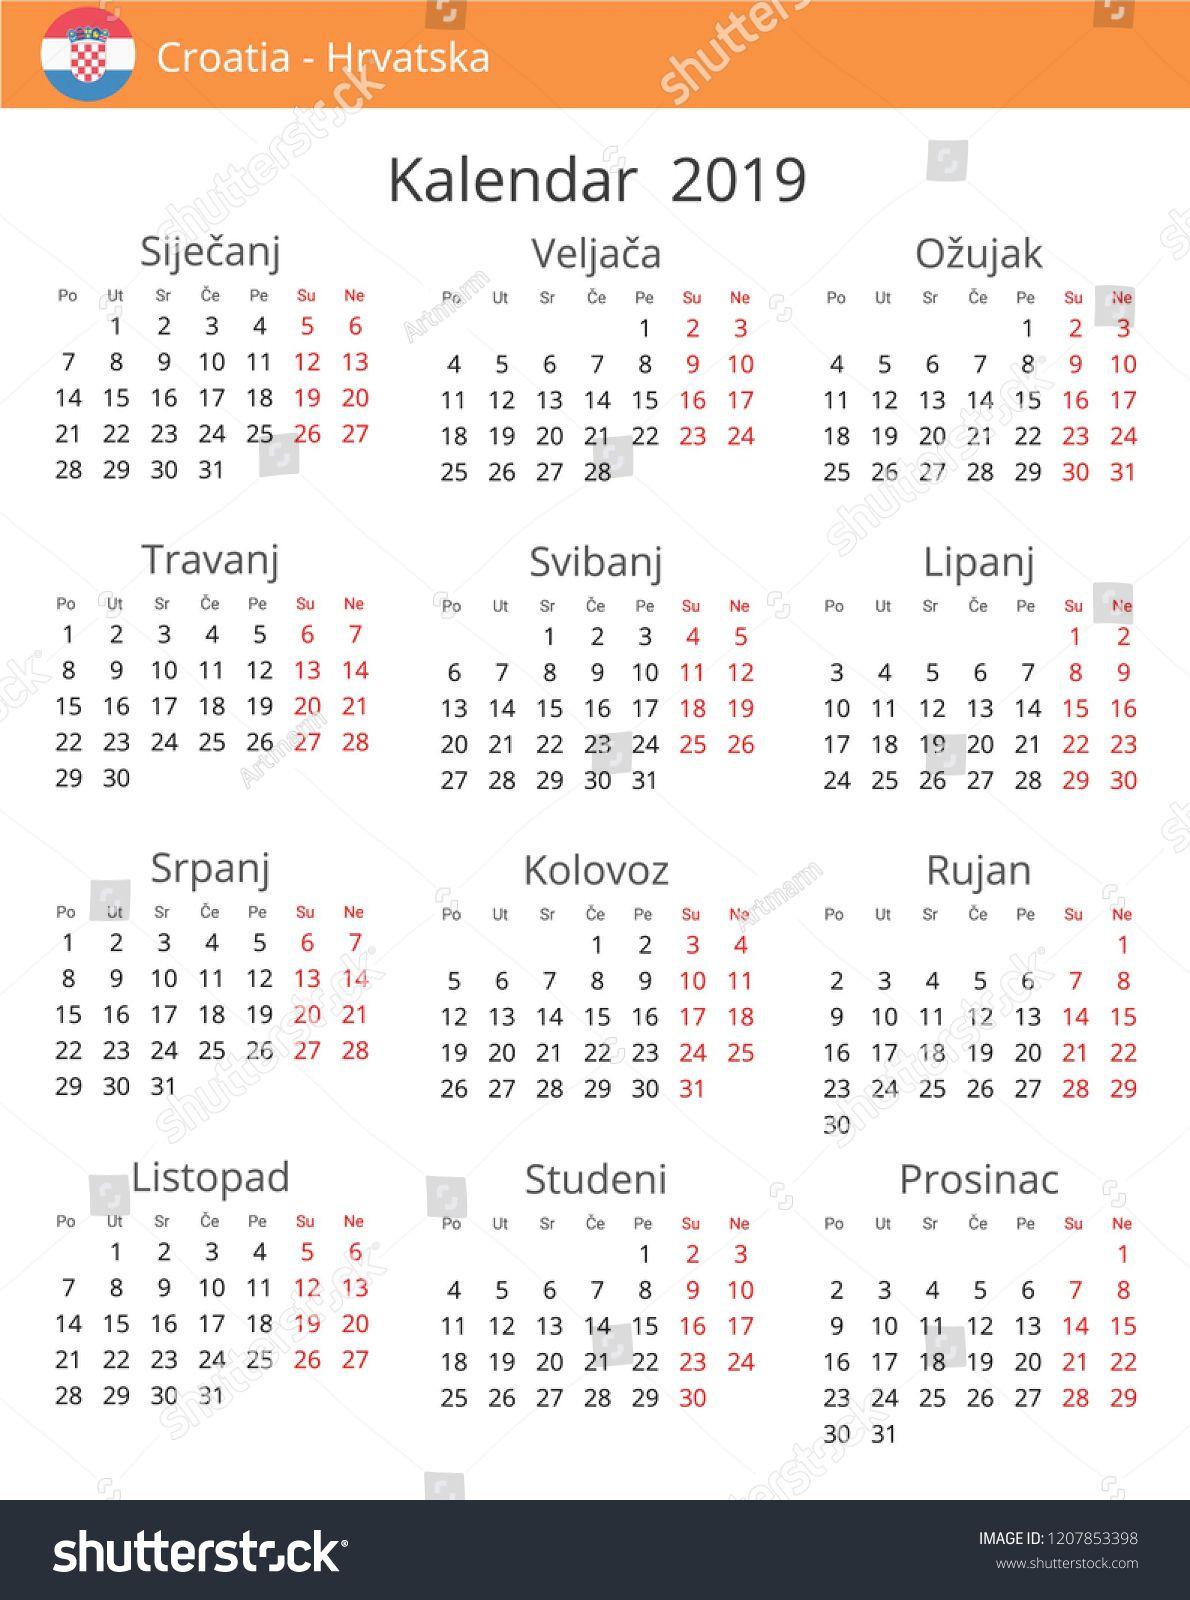 Calendar 2019 year for Croatia country. Croatian language